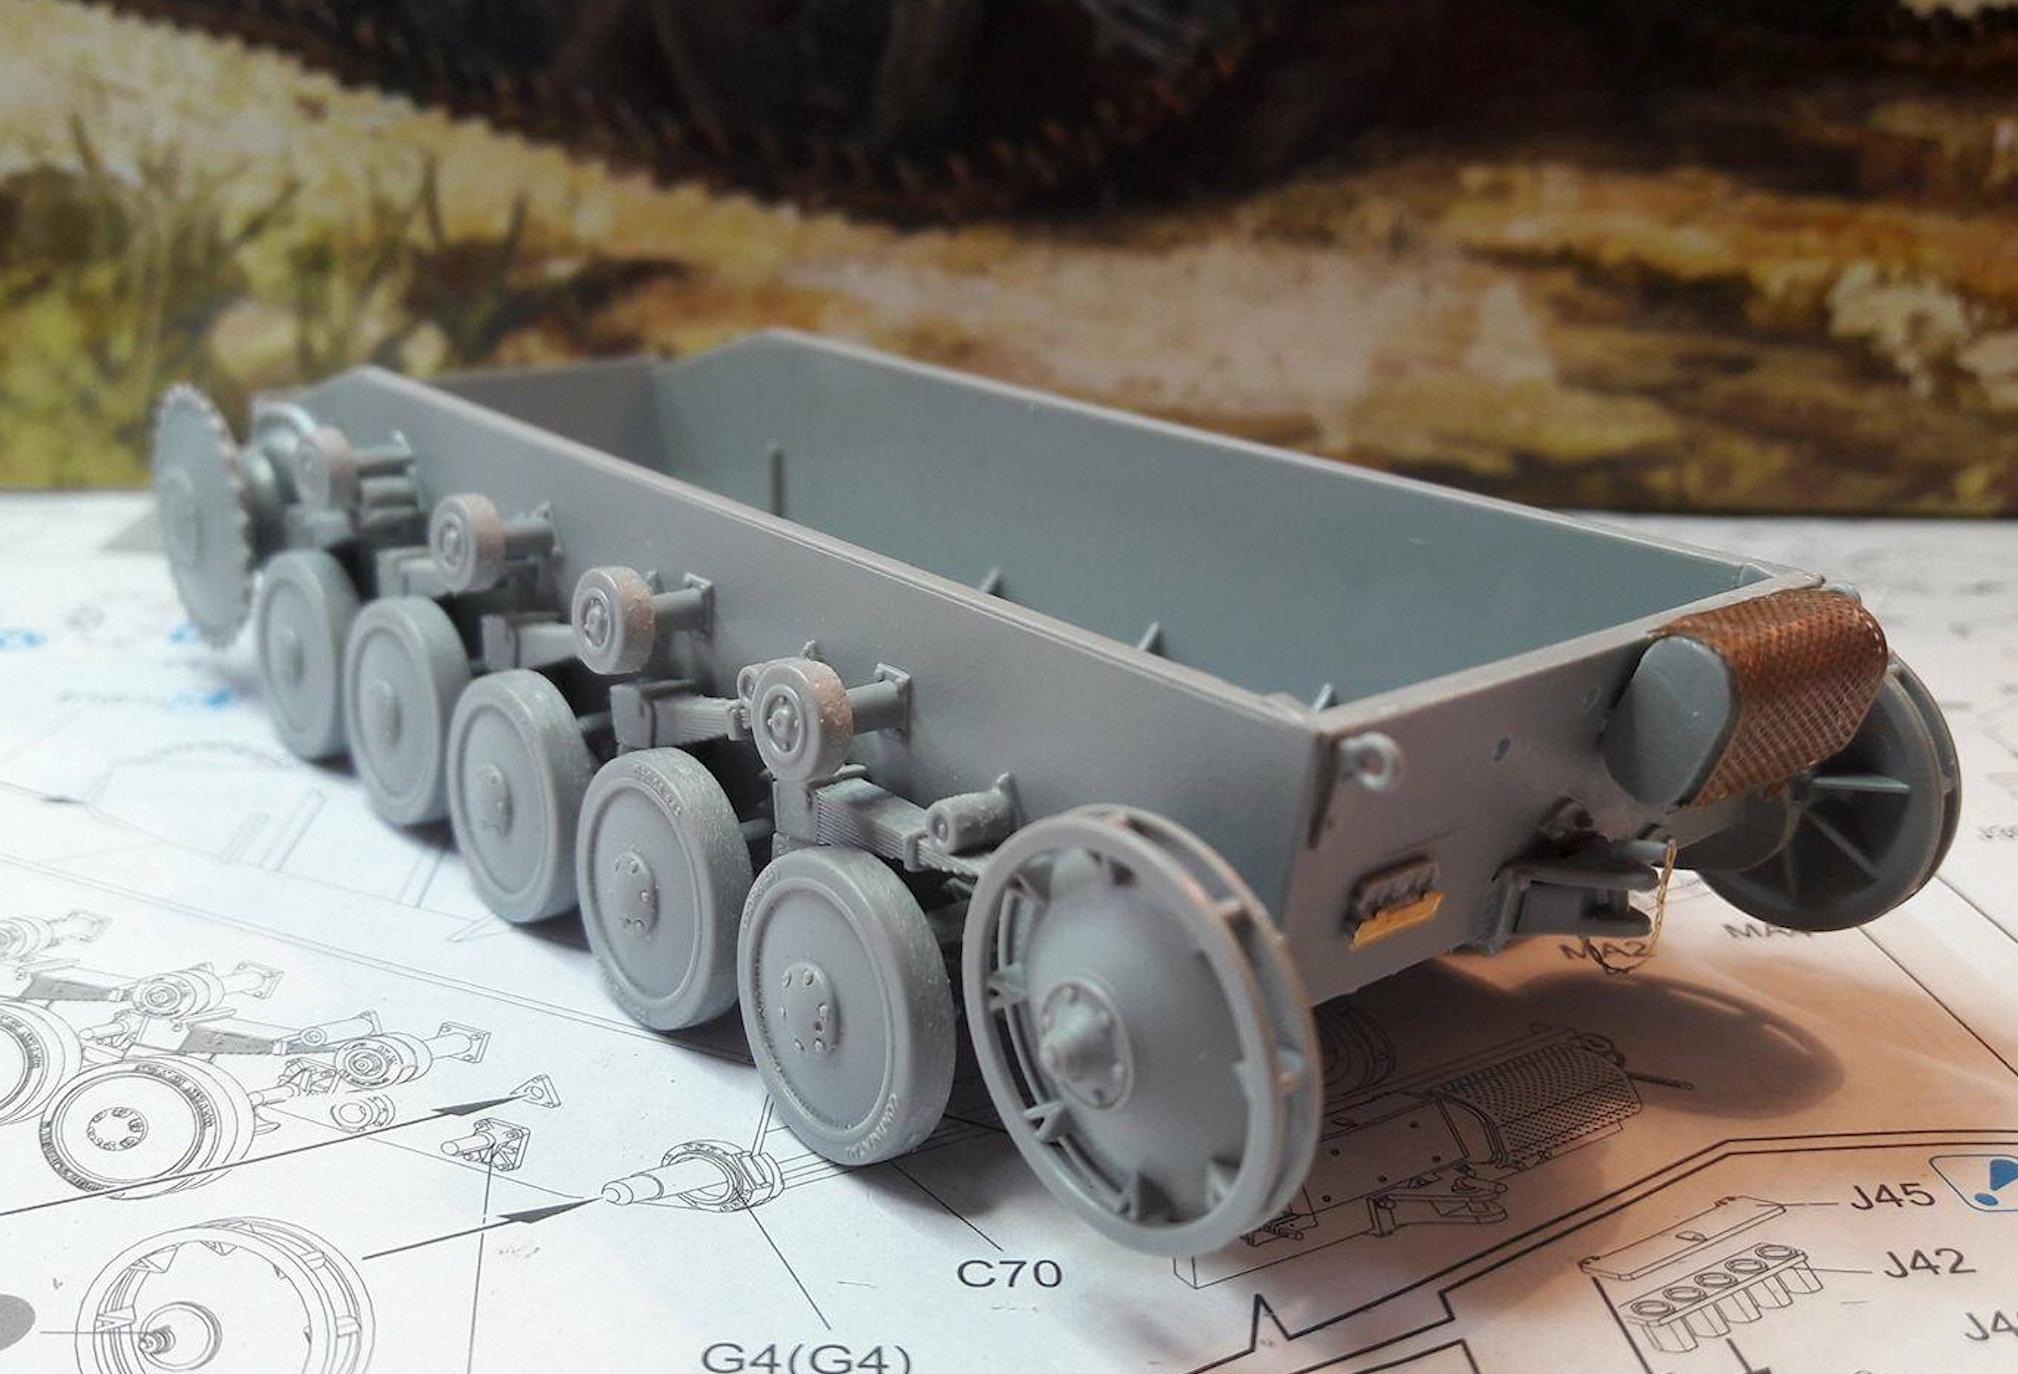 Pz.Kpfw.II Ausf.F - Kharkov 1/35 - Page 2 556594BuildStep1